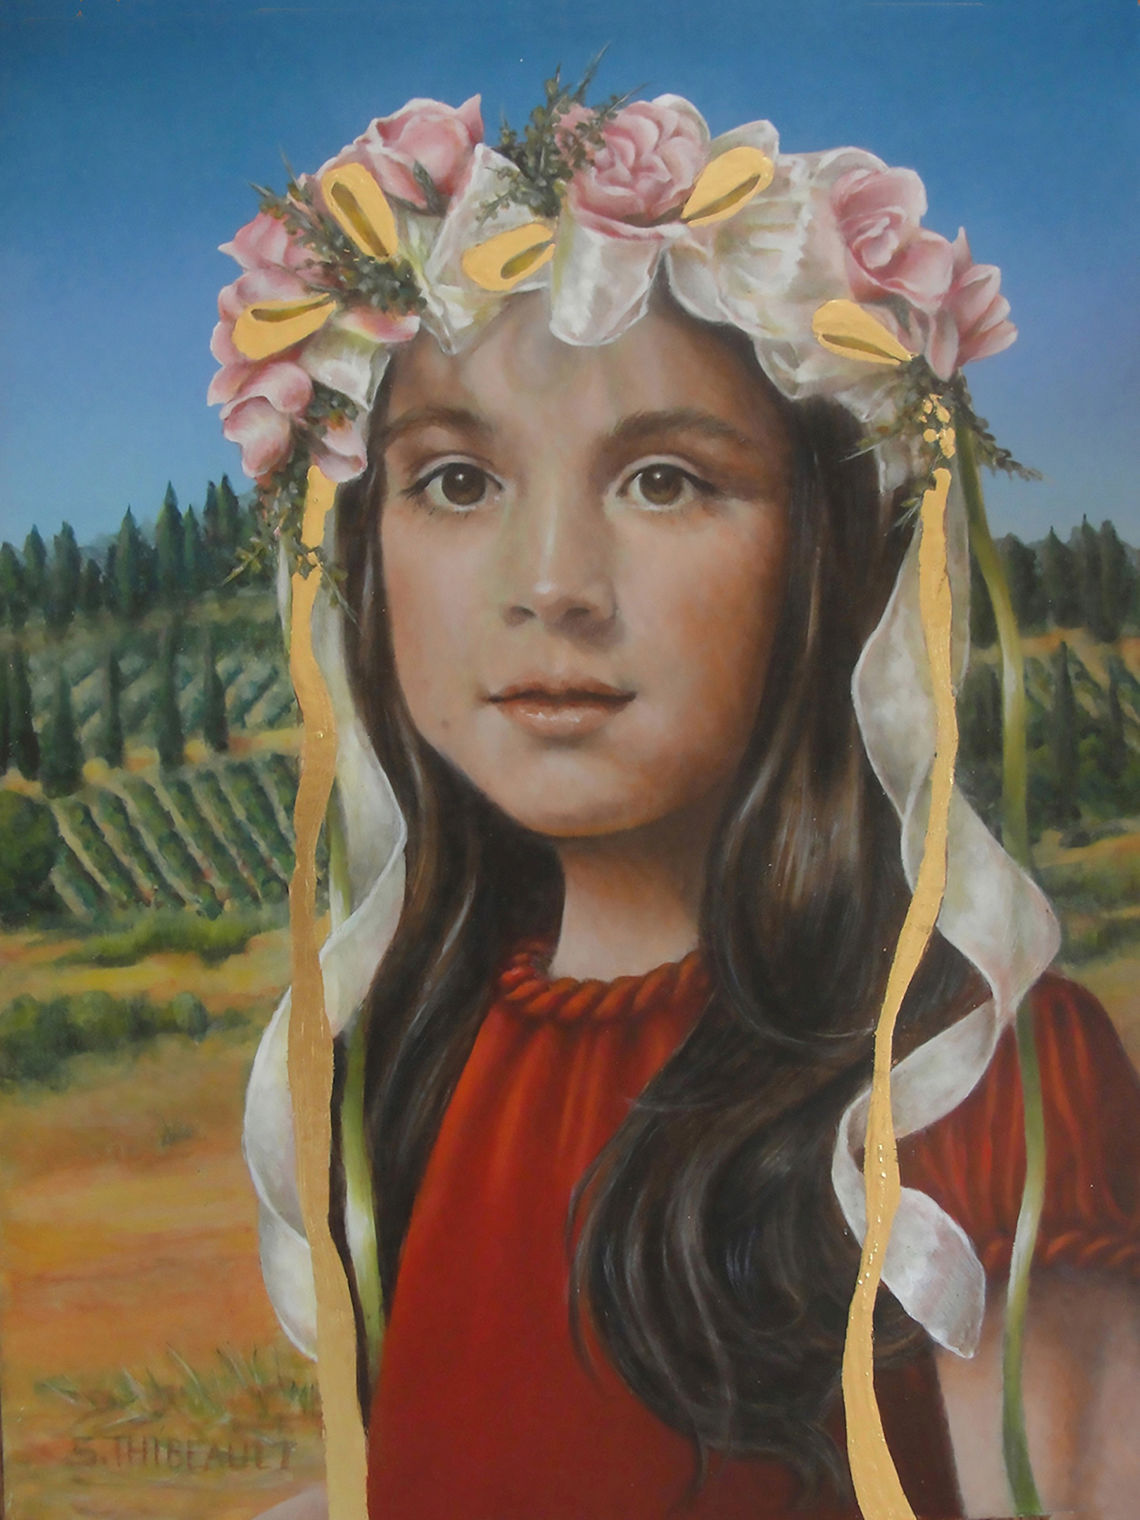 9-8 La Mia Nipotina d'Oro by Sandy Thibeault